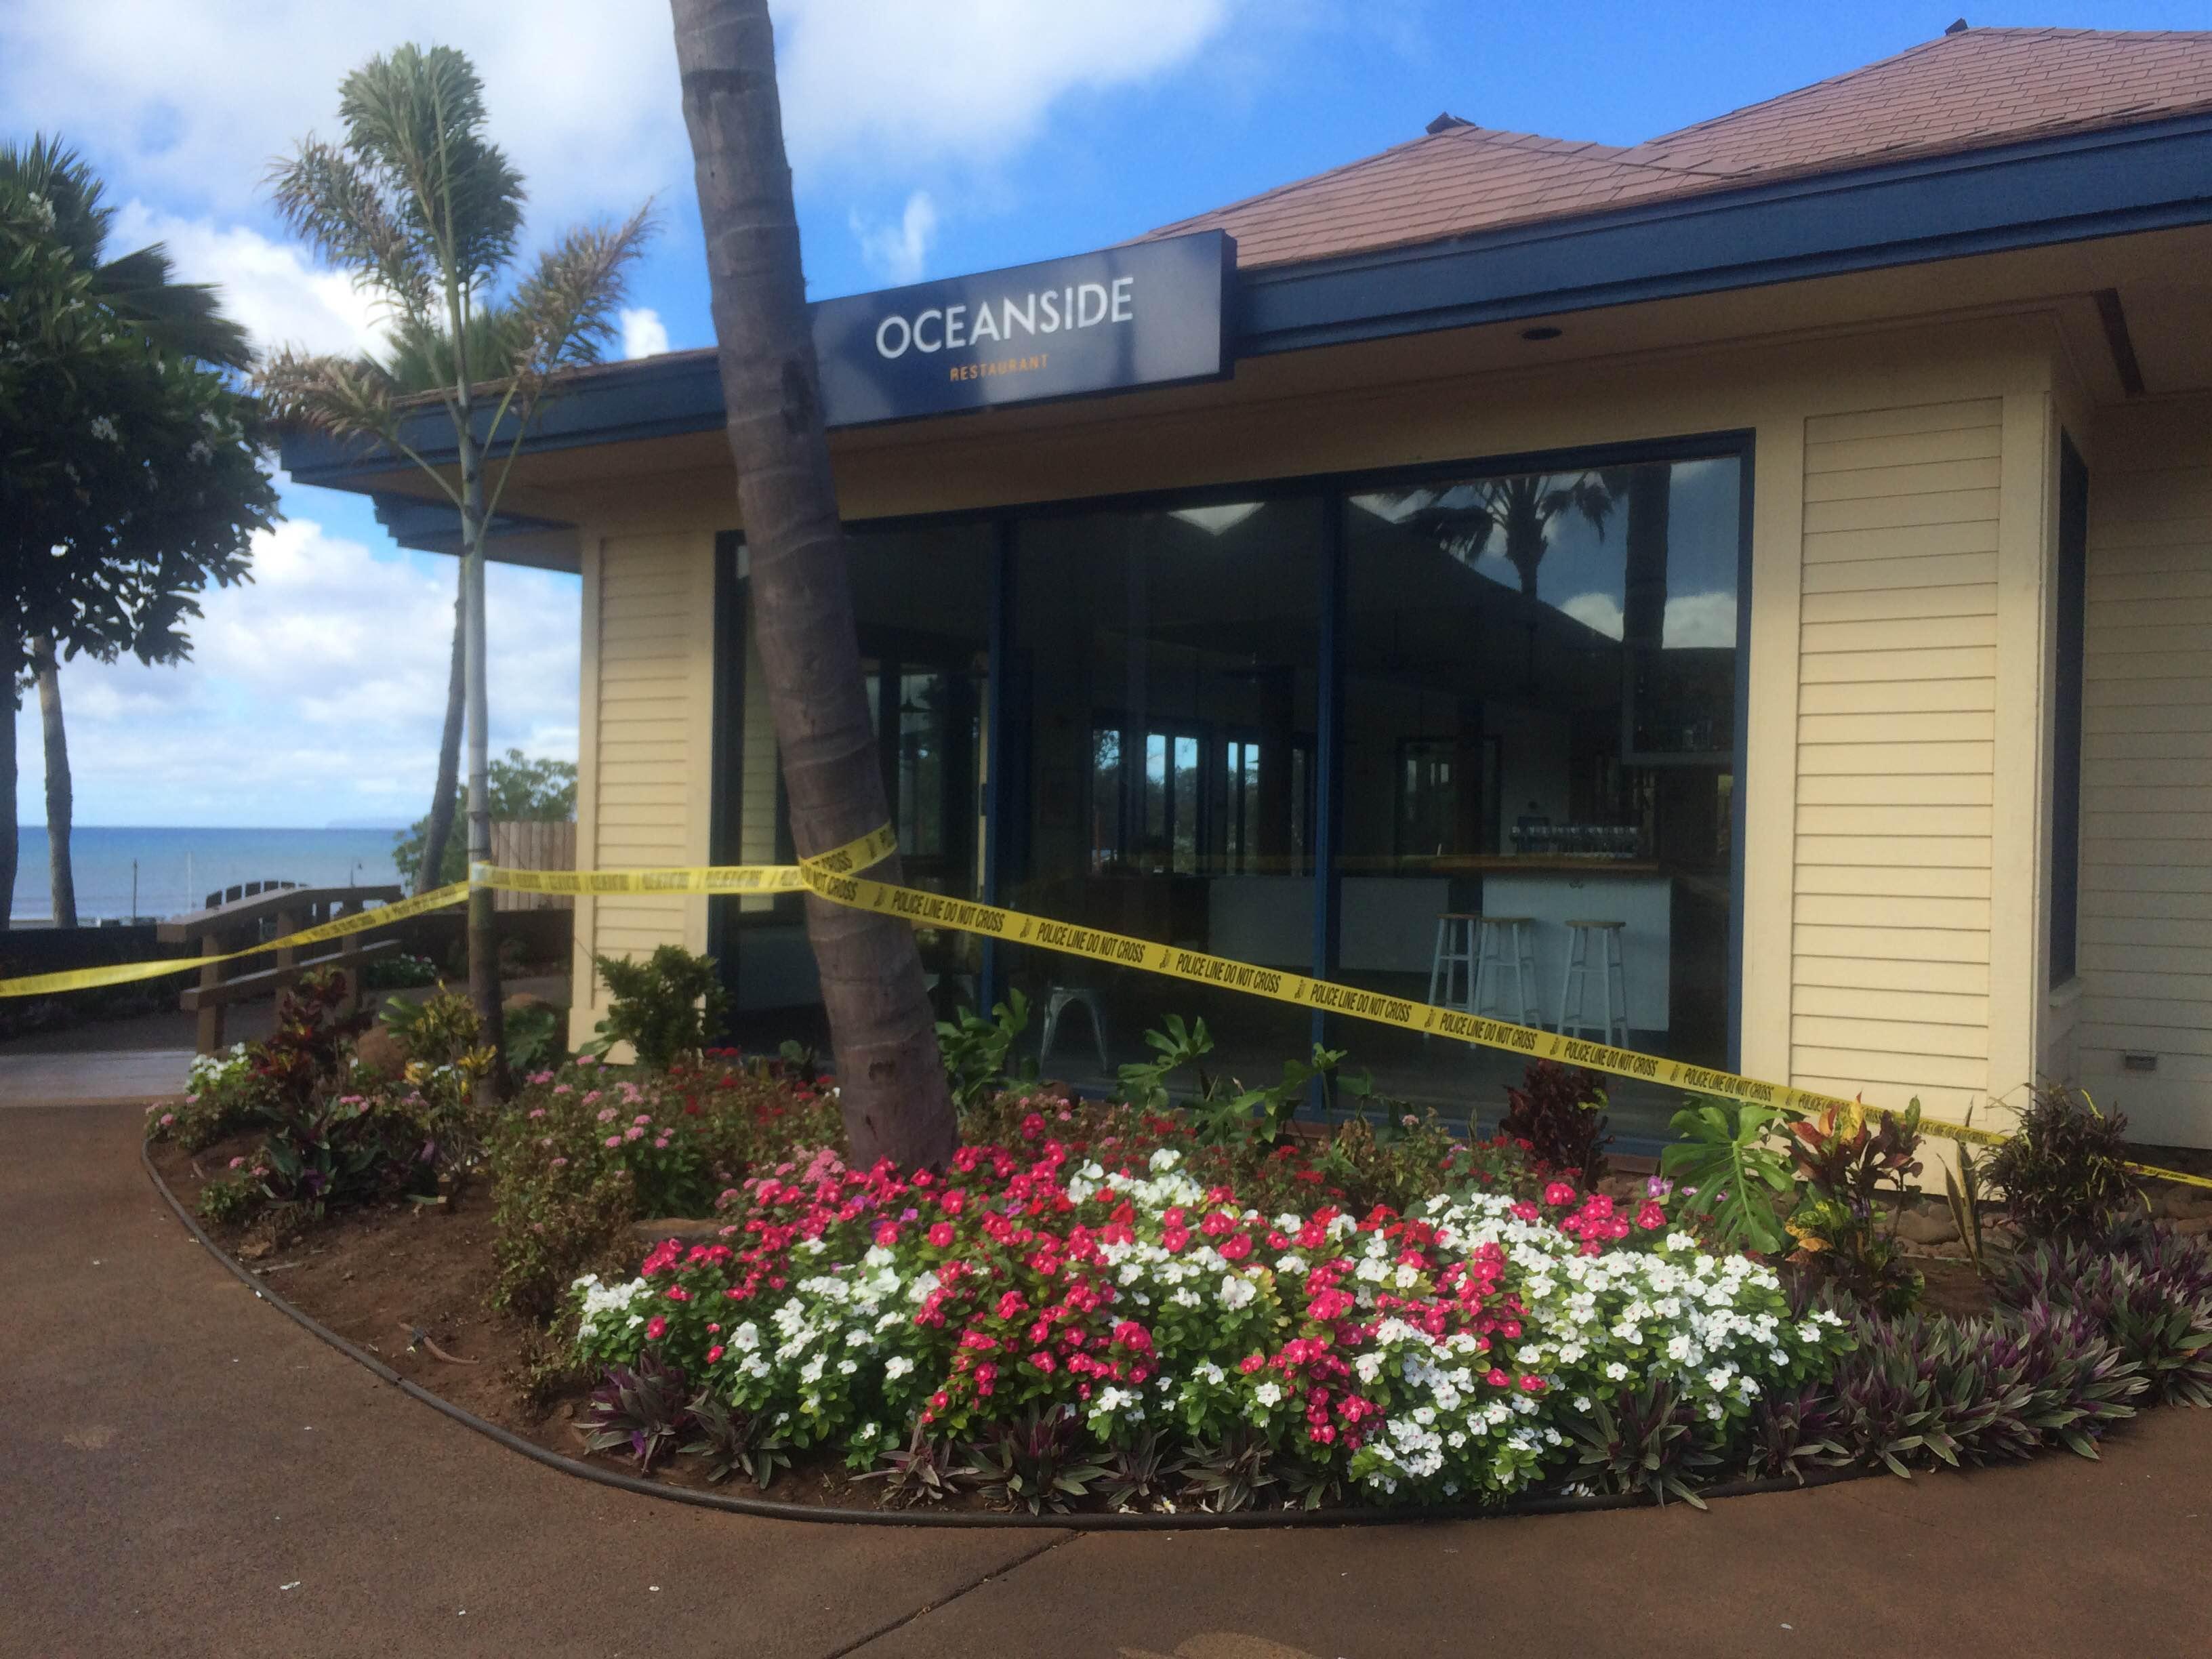 Oceanside Restaurant at Māʻlaea. Photo (6.24.16) credit: Kiaora Bohlool.